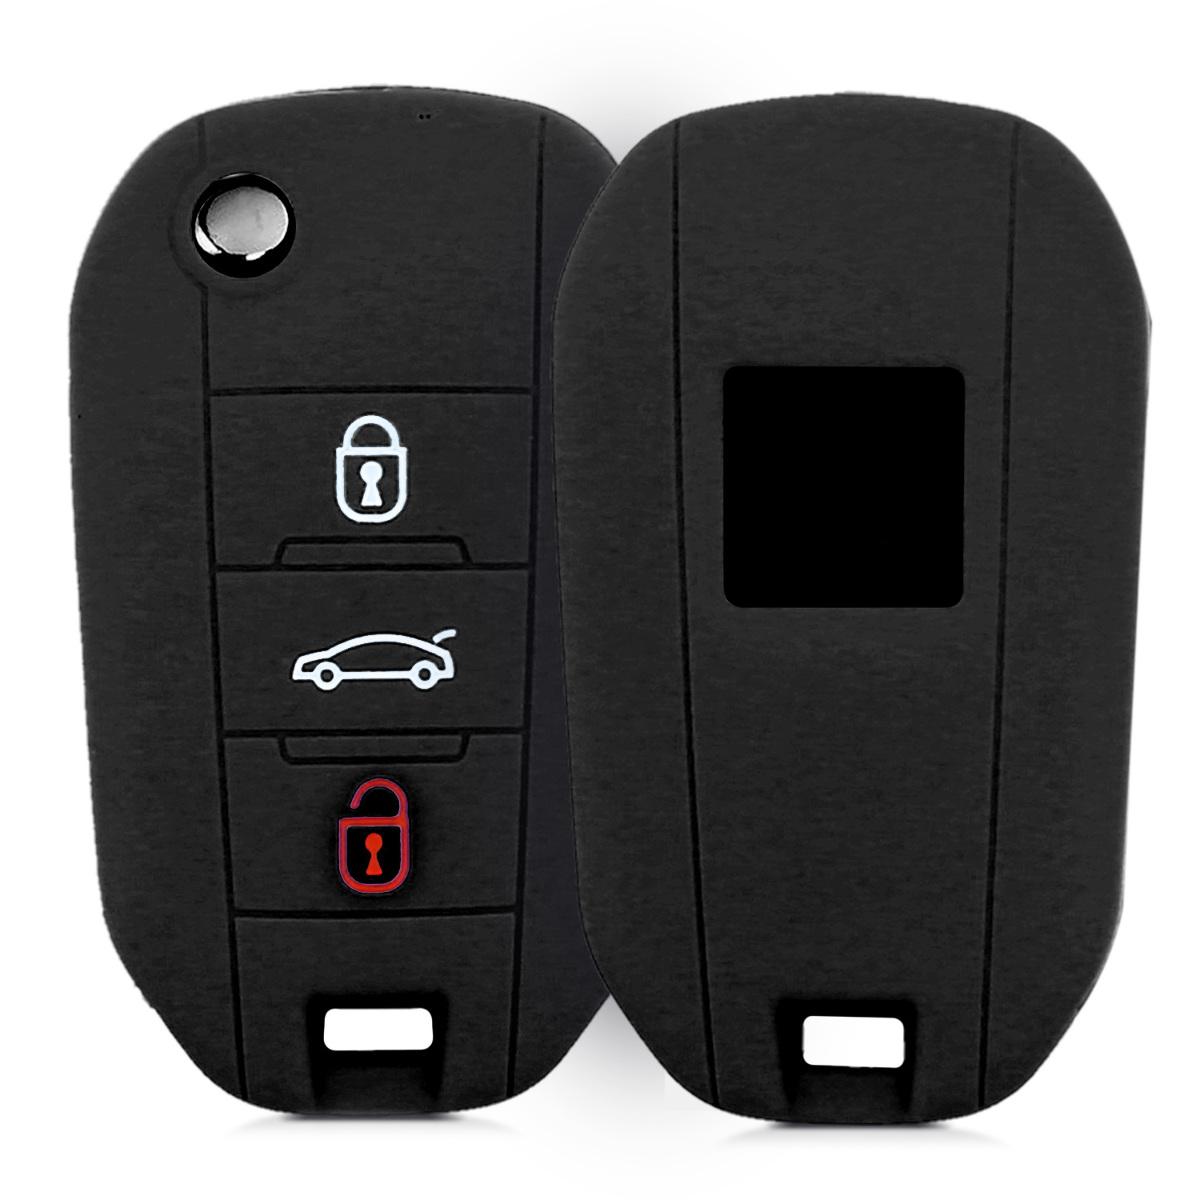 KW Θήκη Κλειδιού Peugeot / Citroen - Σιλικόνη - 3 Κουμπιά - Black (43670.01)